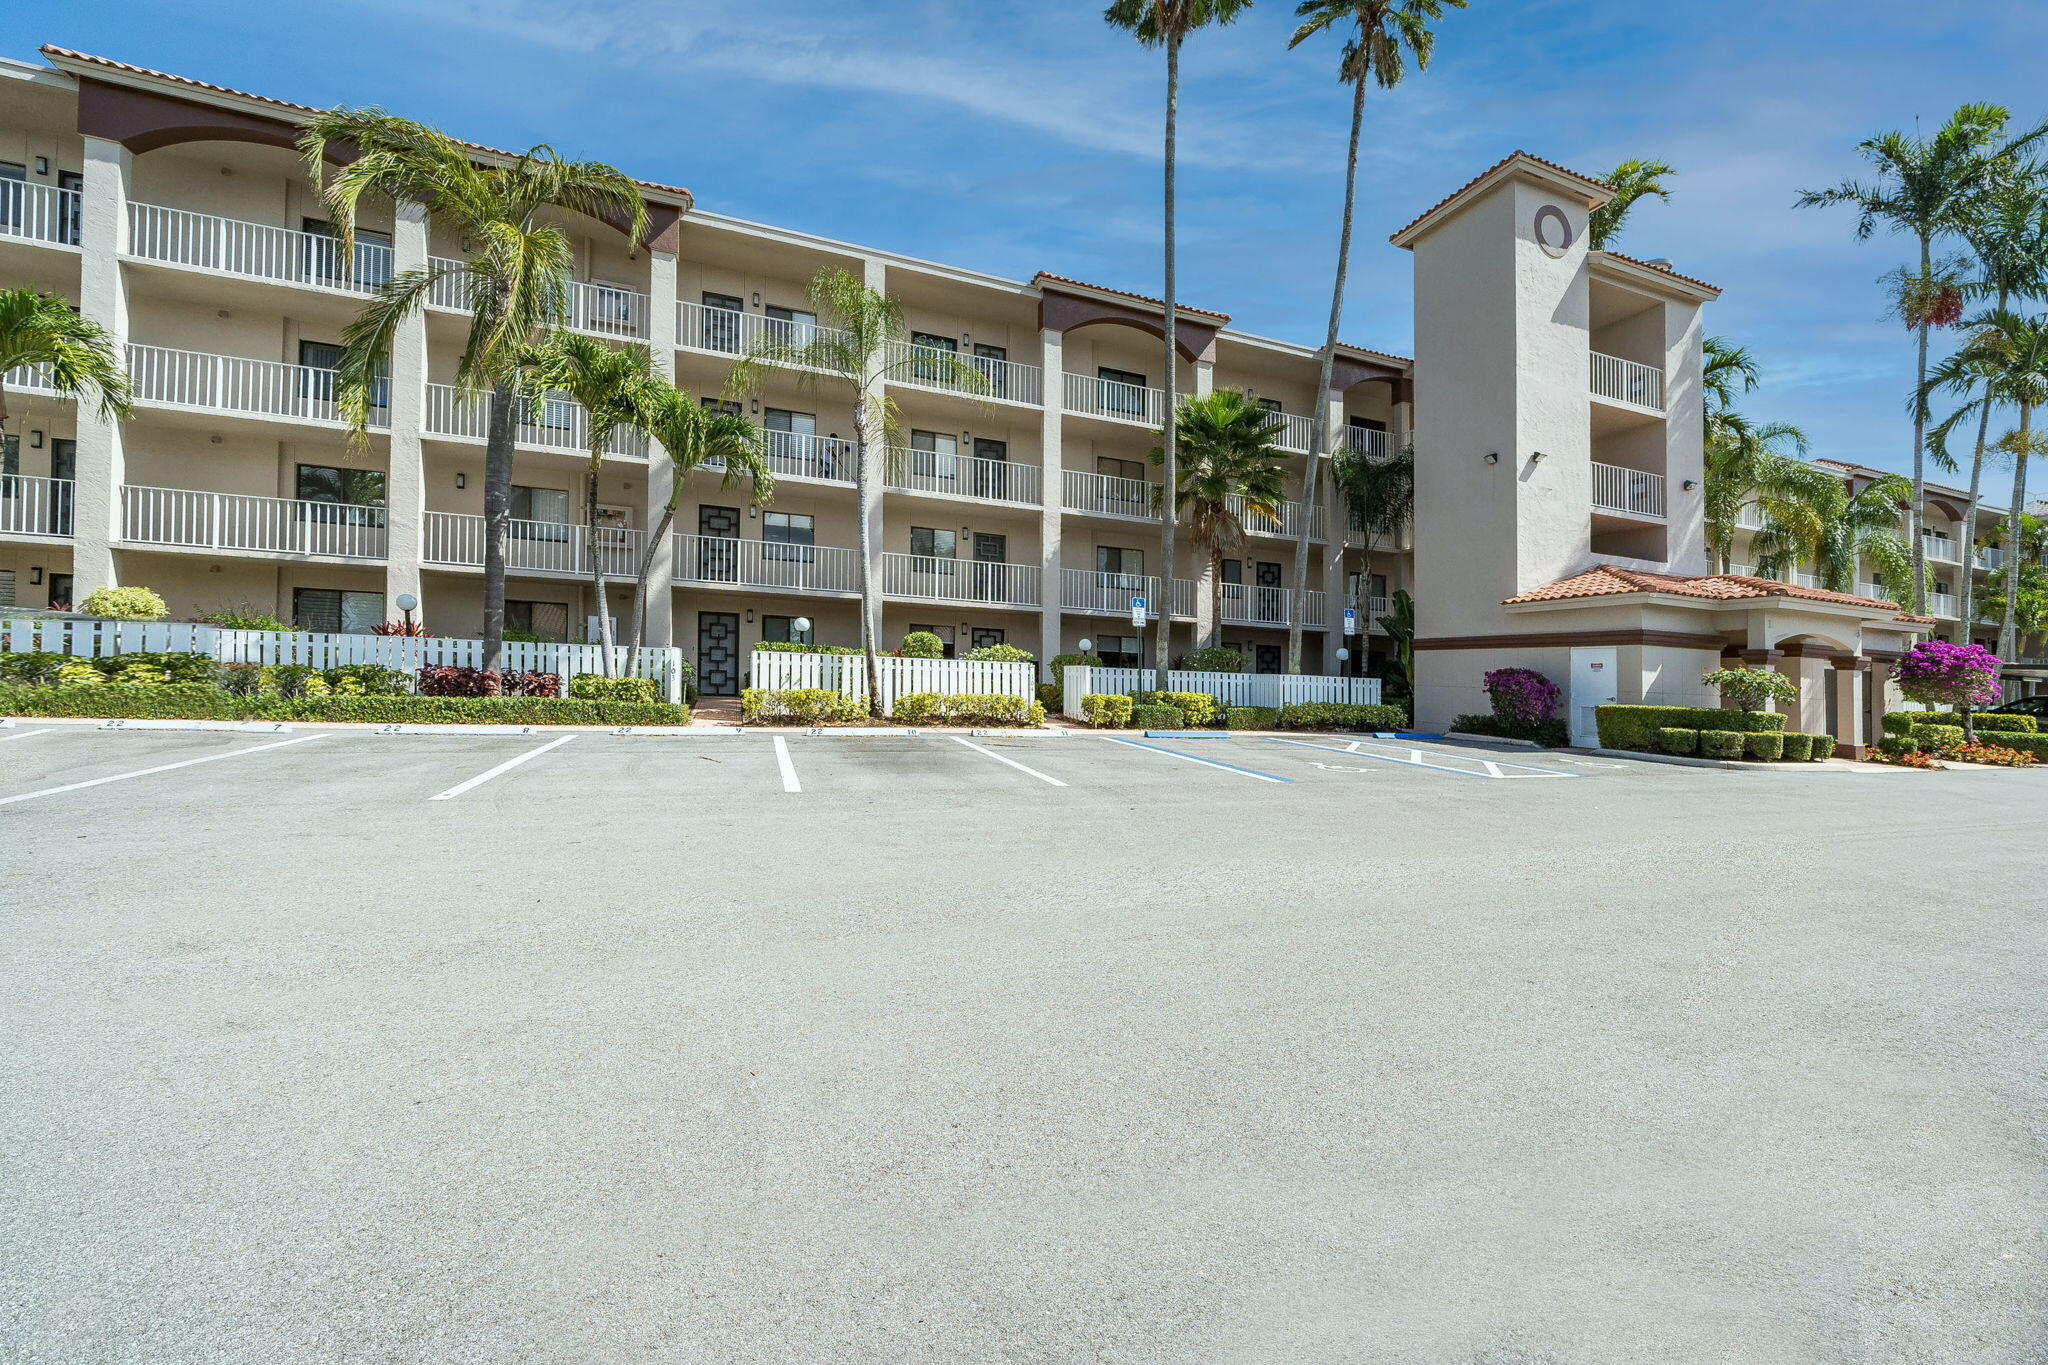 6149  Pointe Regal Circle 208 For Sale 10725219, FL